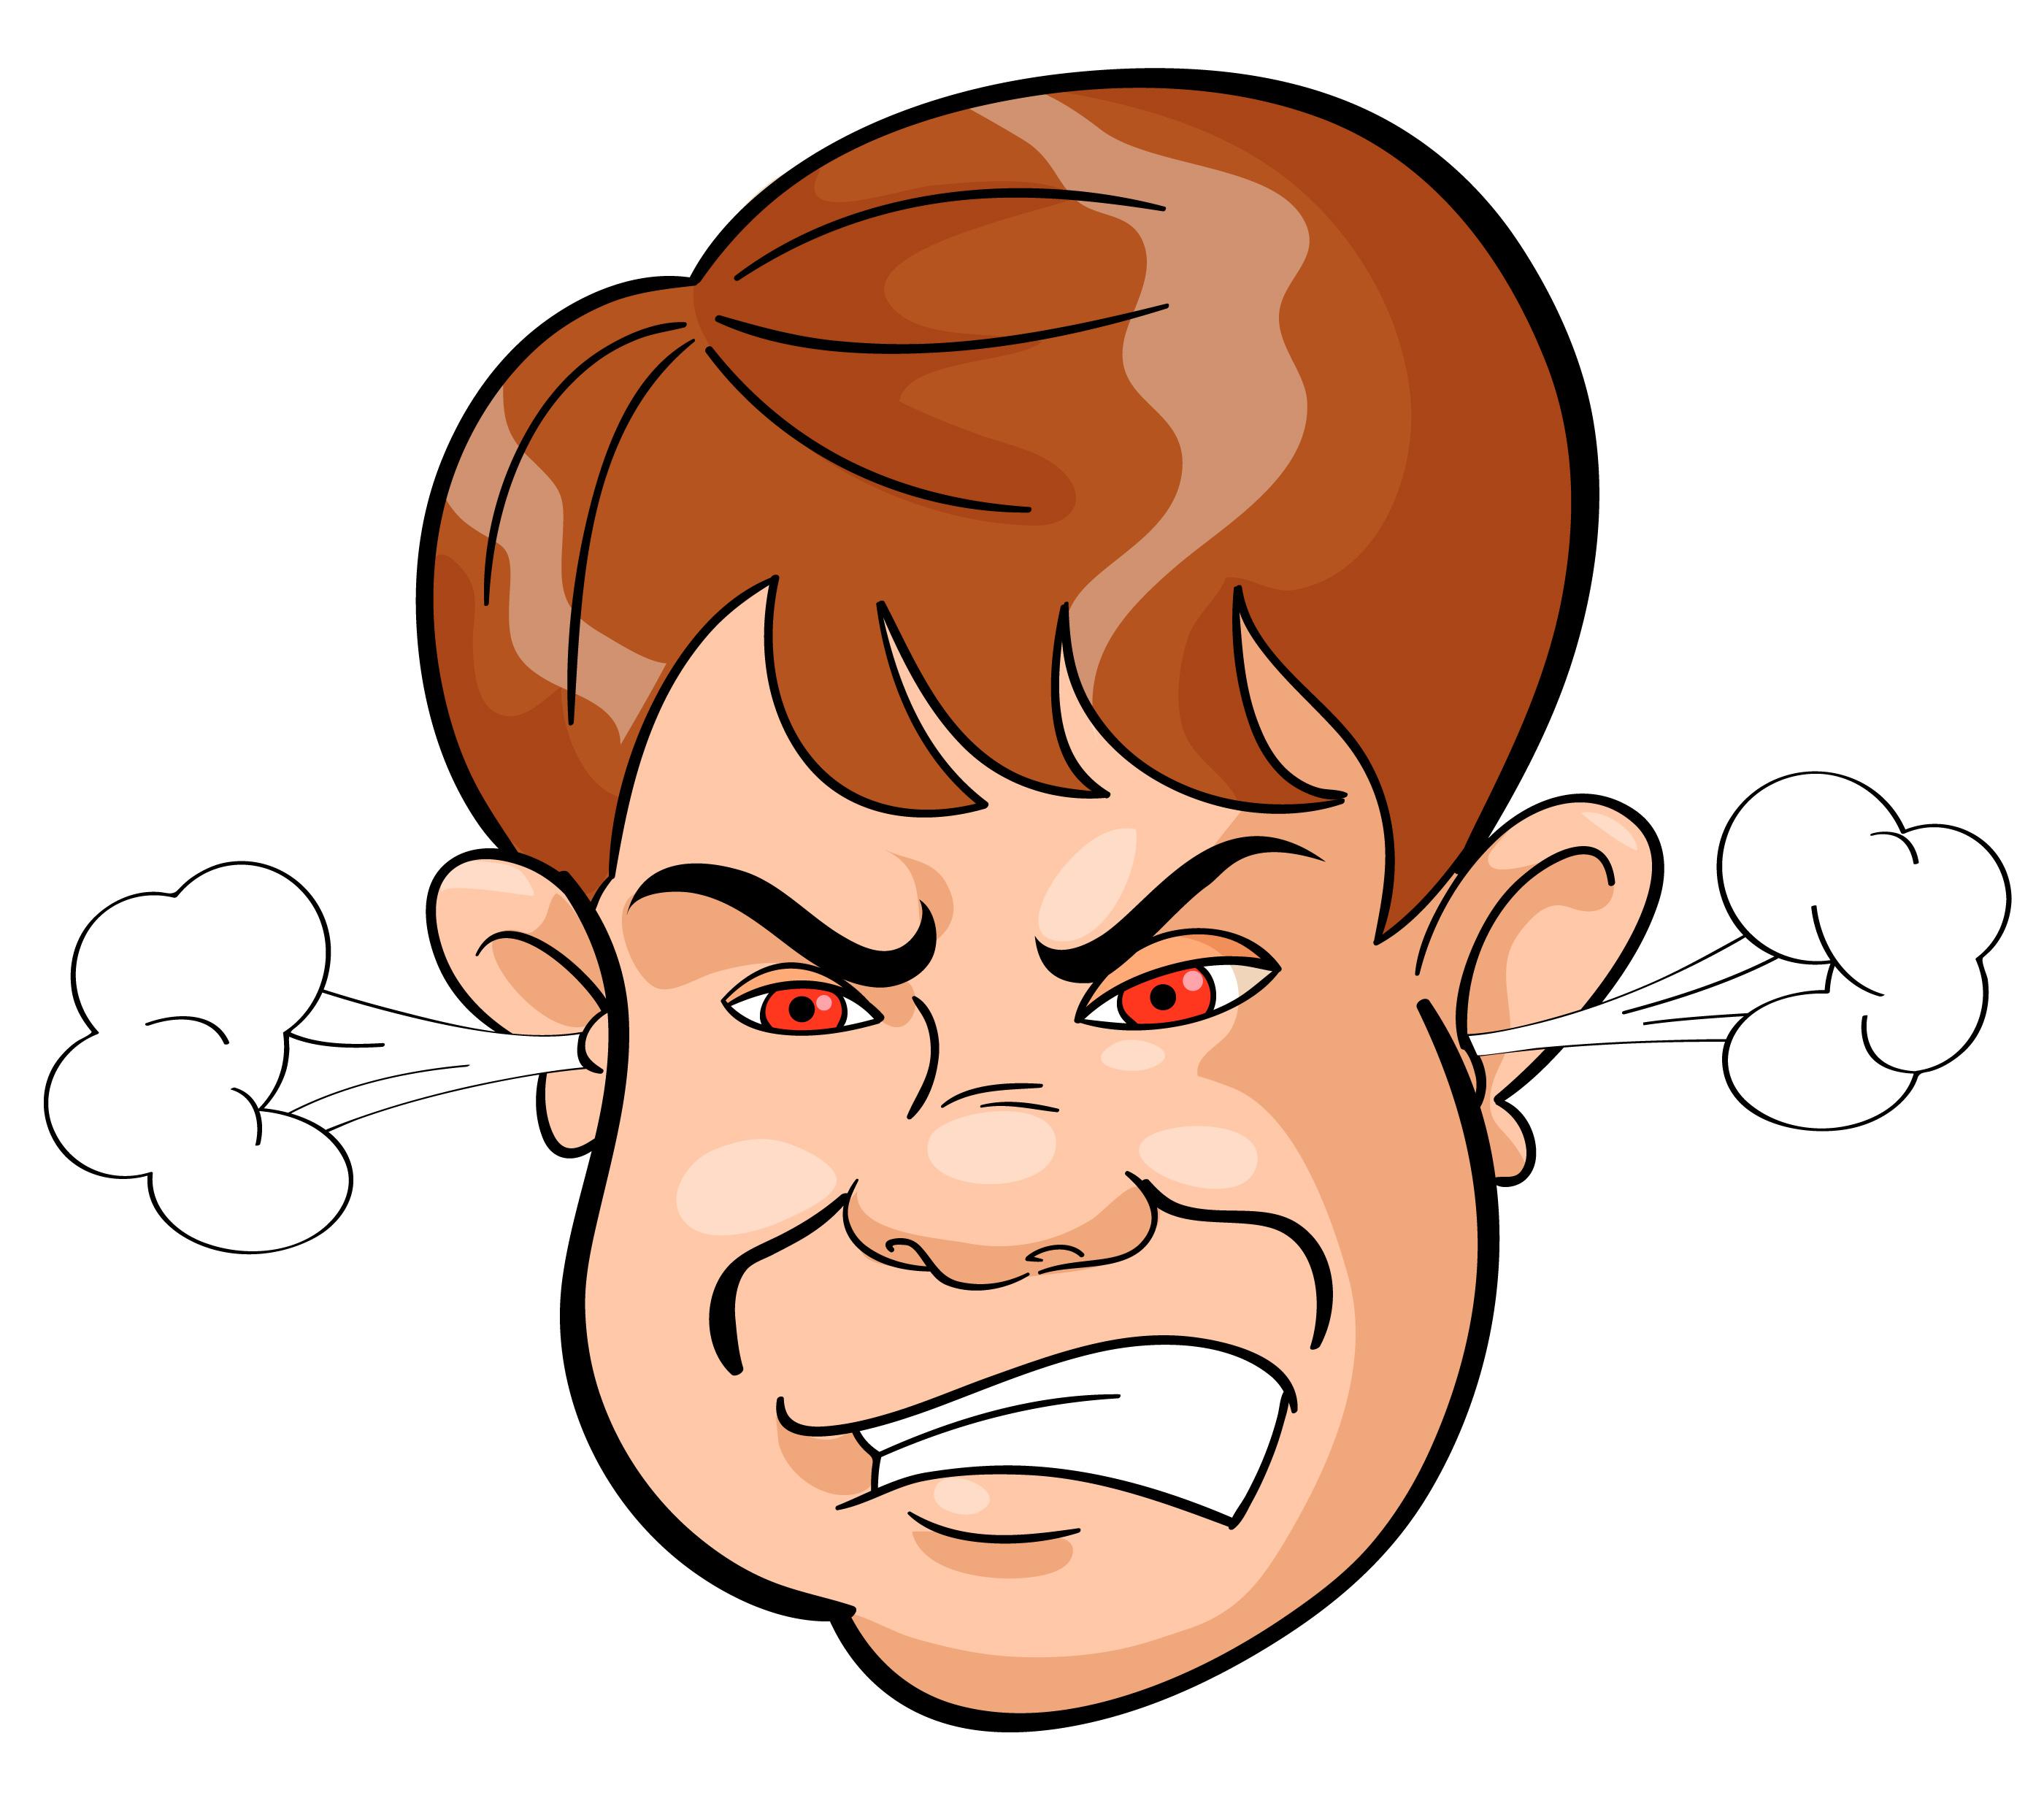 Clip Art Angry Clip Art angry clipart best clip art tumundografico